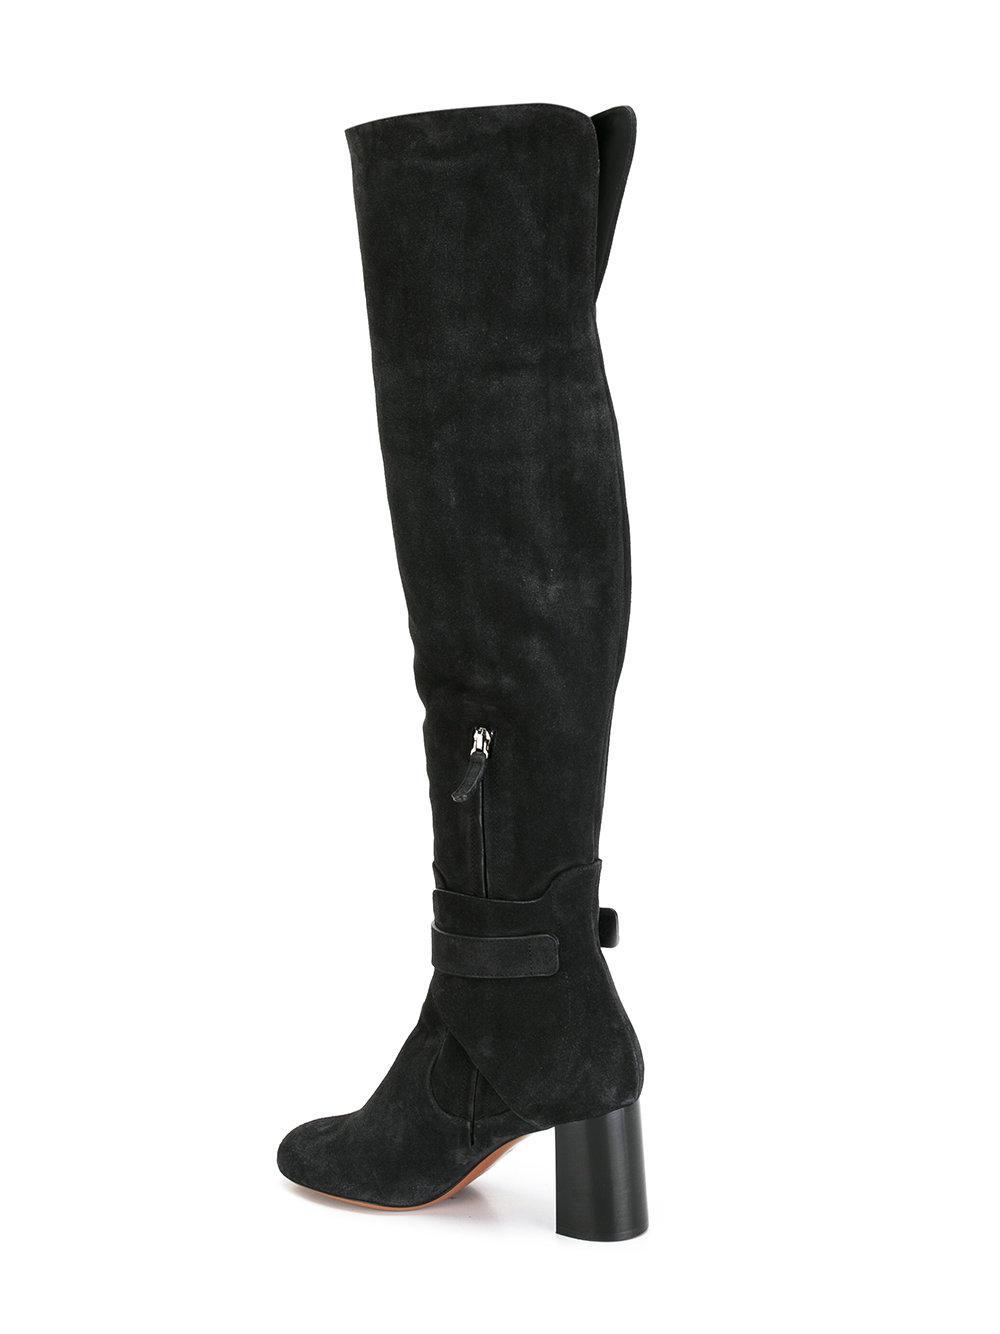 Chloé Millie knee high boots nJxdn